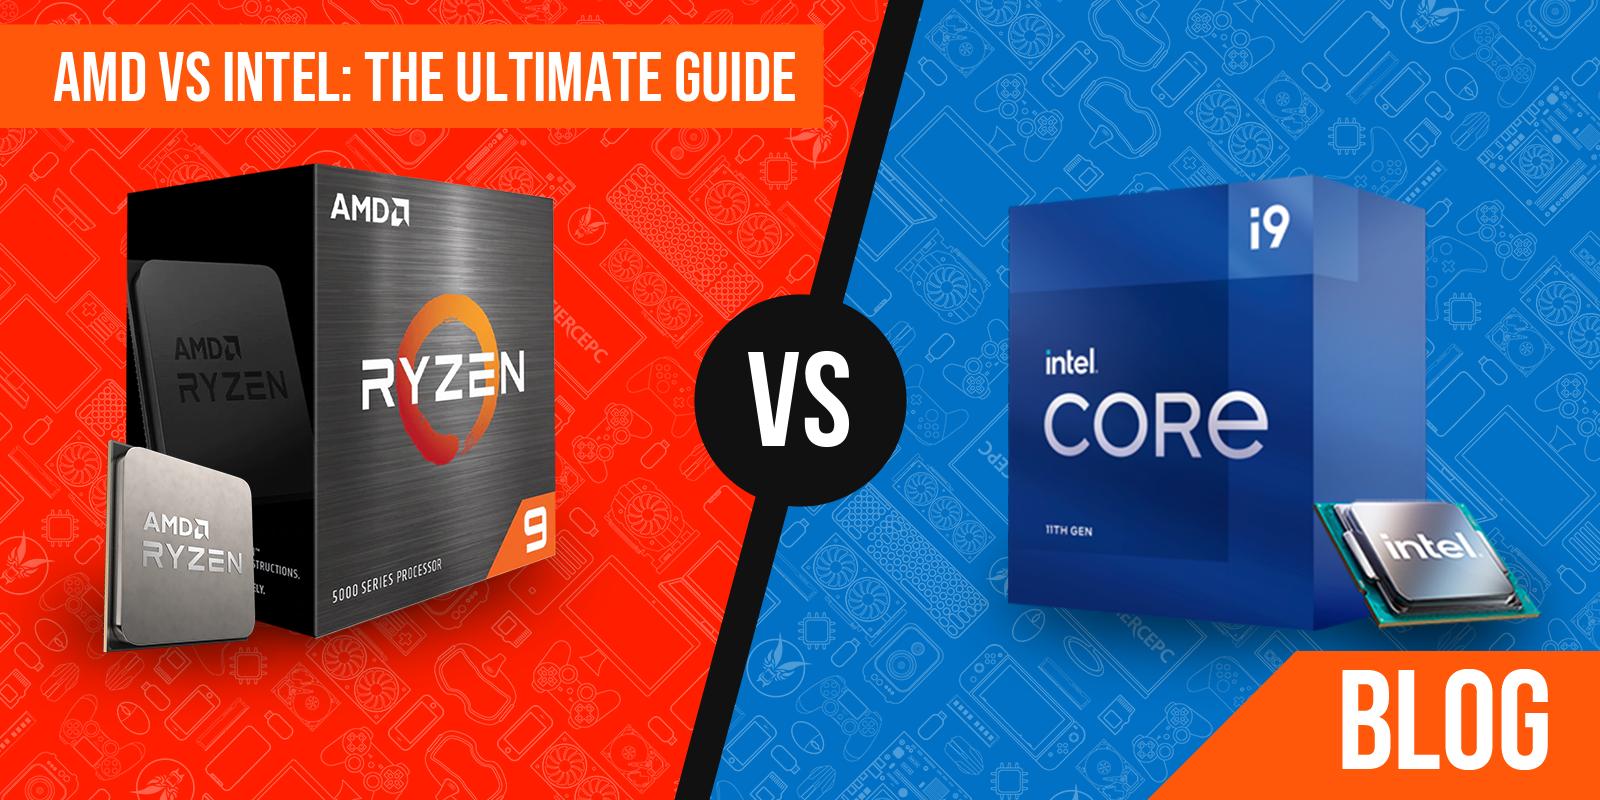 Blog - AMD vs Intel the ultimate guide guide